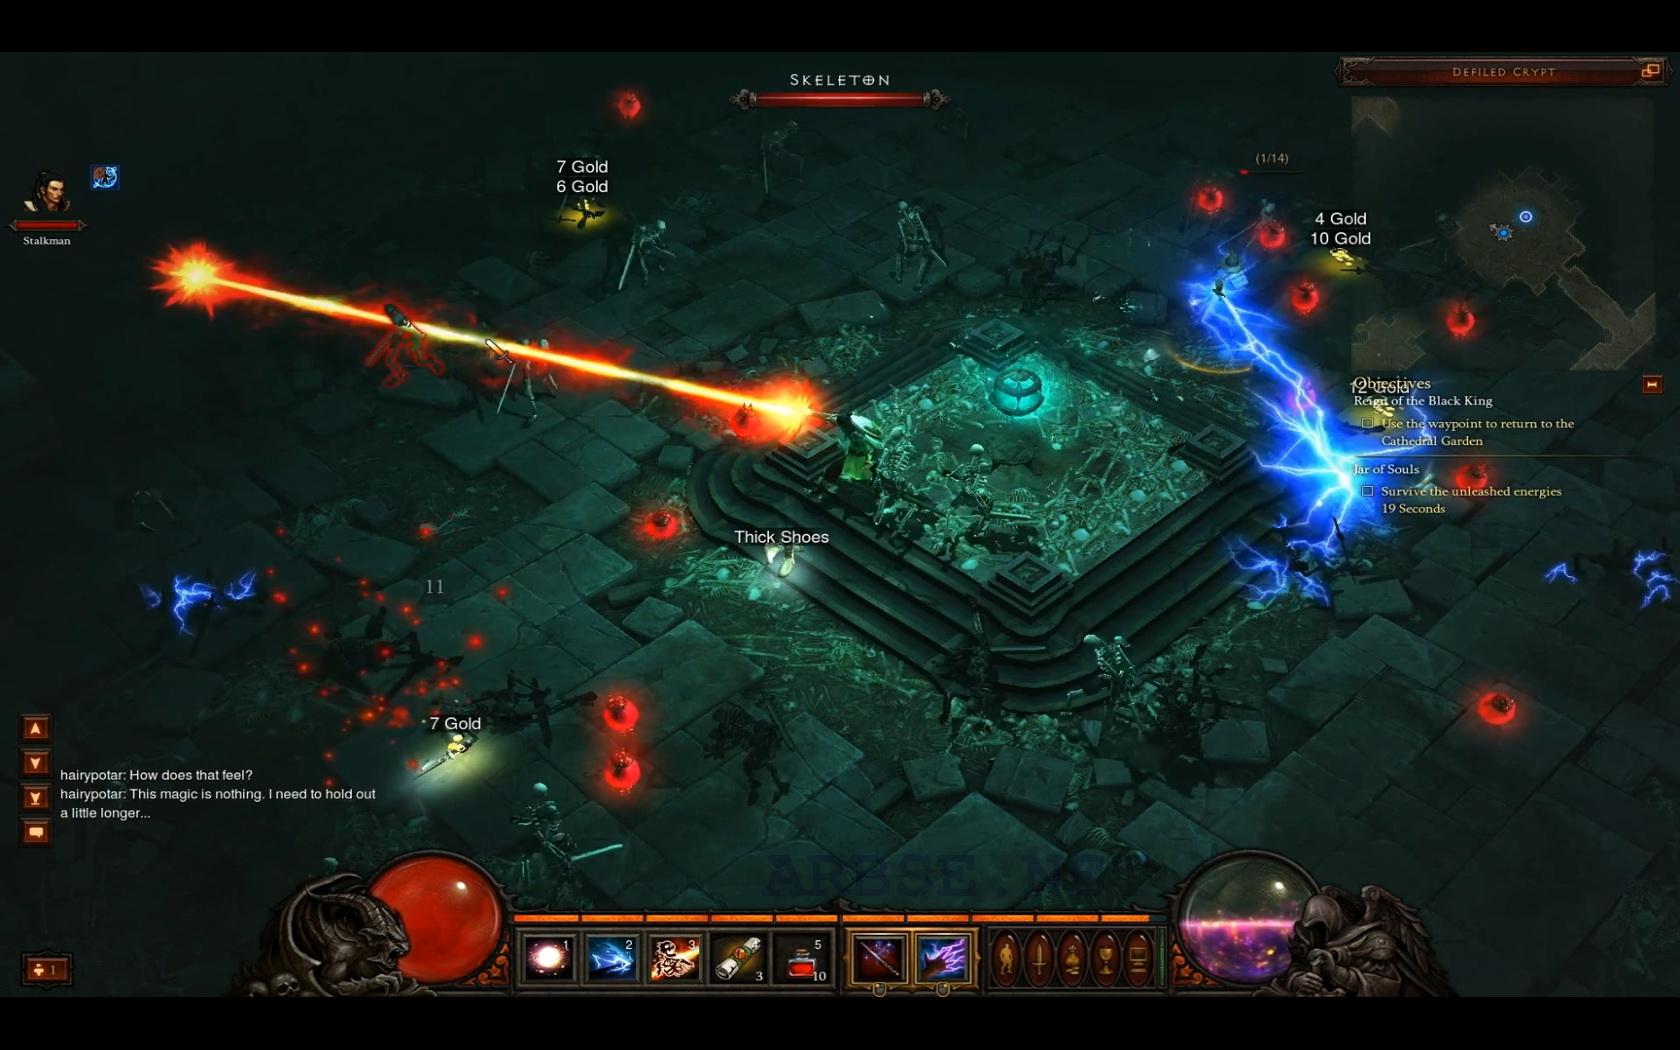 �����.��. ������� <strong>Diablo 3 III</strong> CDKEY RU |Battlenet keys|+������+<strong>3</strong> <strong>...</strong>